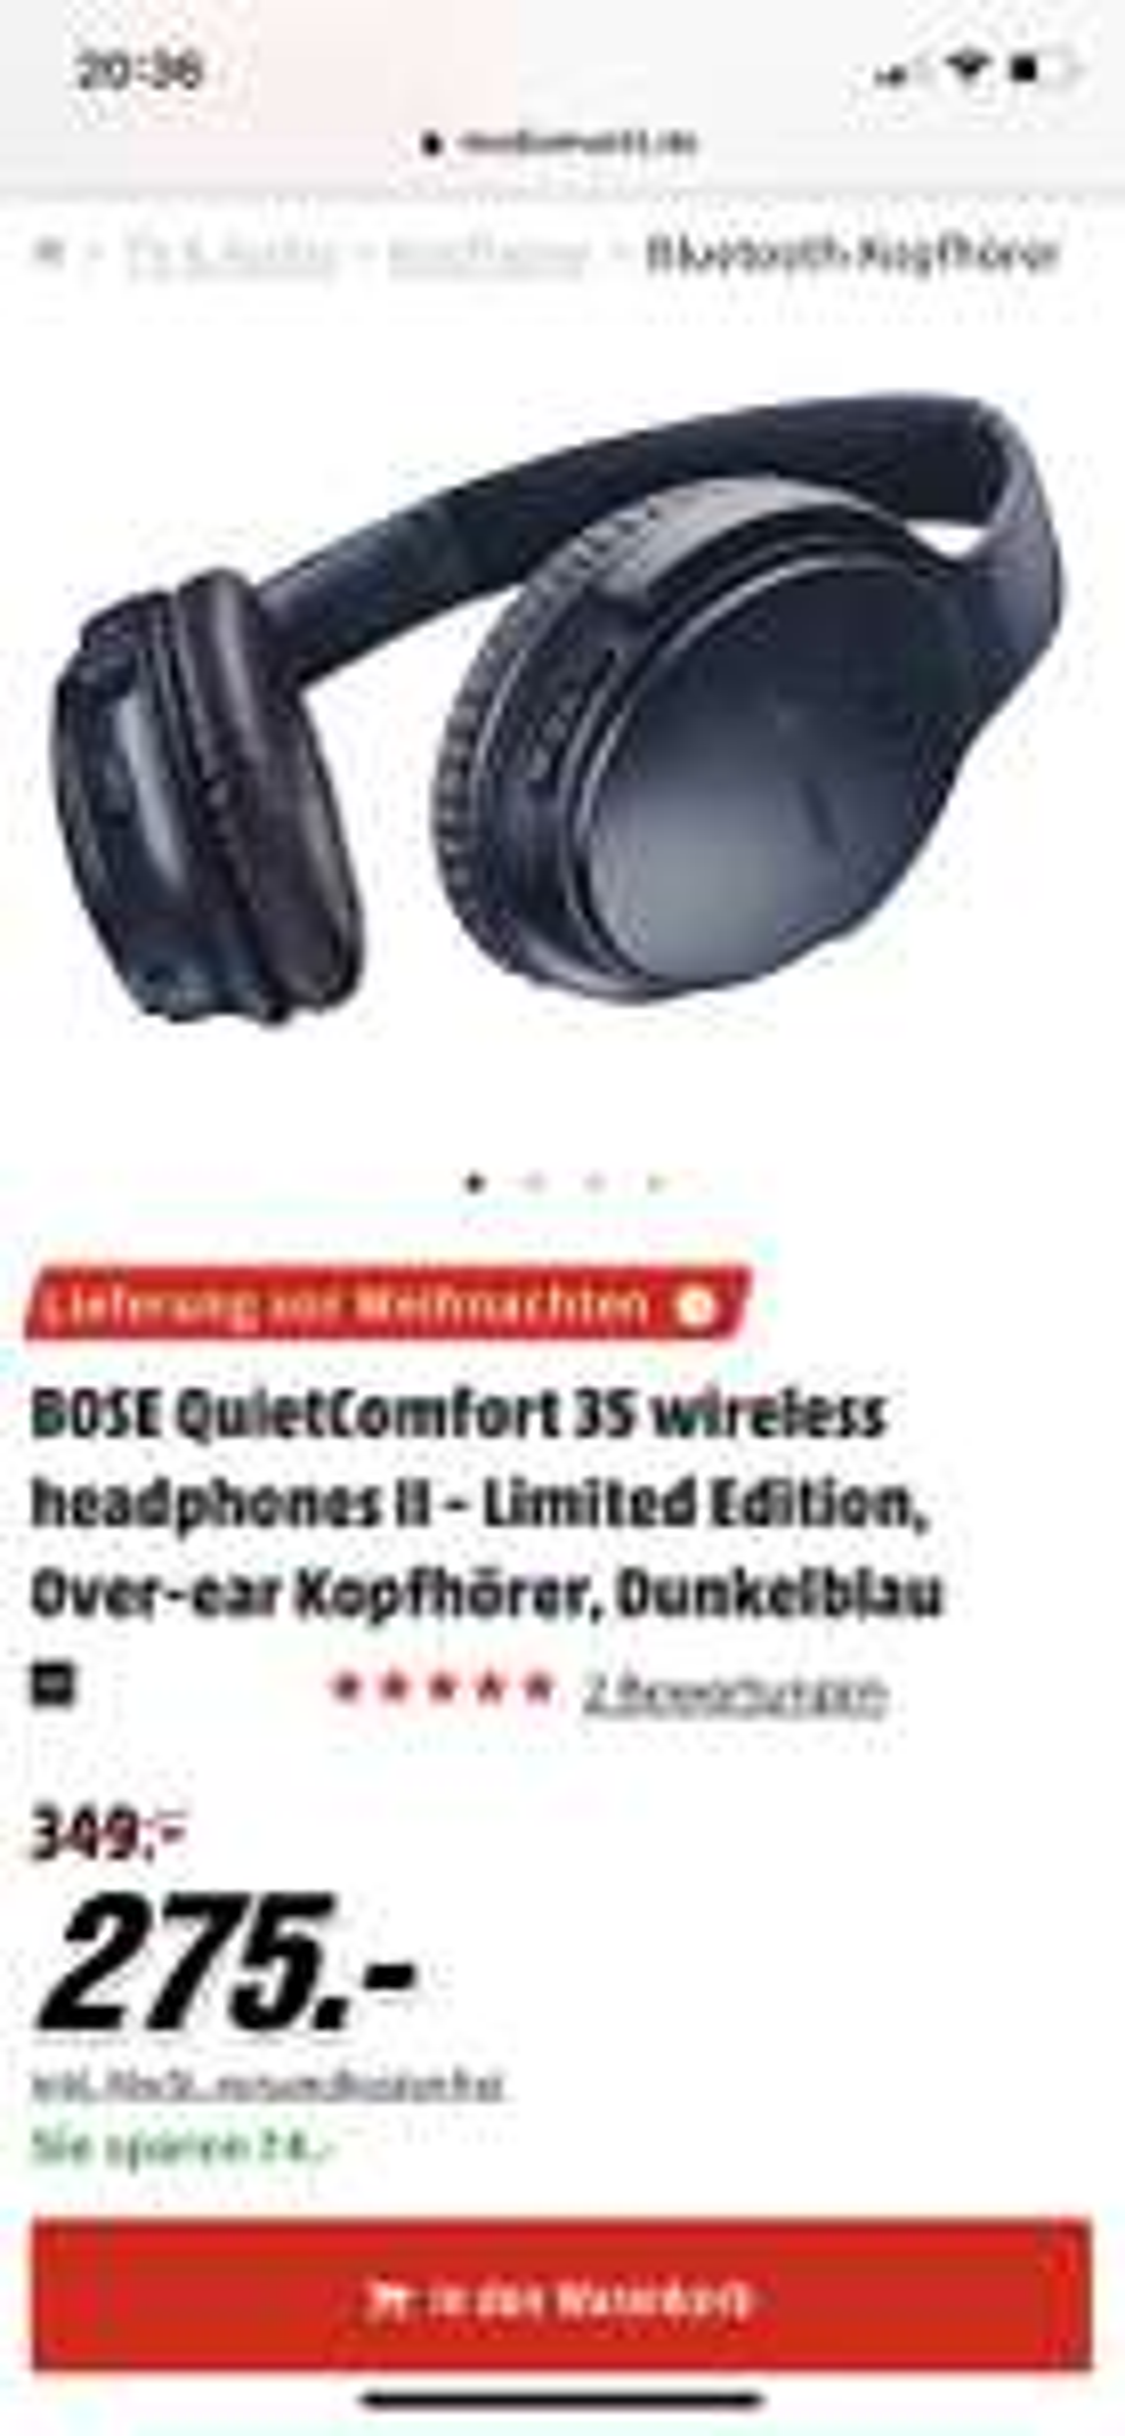 BOSE QuietComfort 35 wireless headphones II - Limited Edition, Over-ear Kopfhörer, Dunkelblau